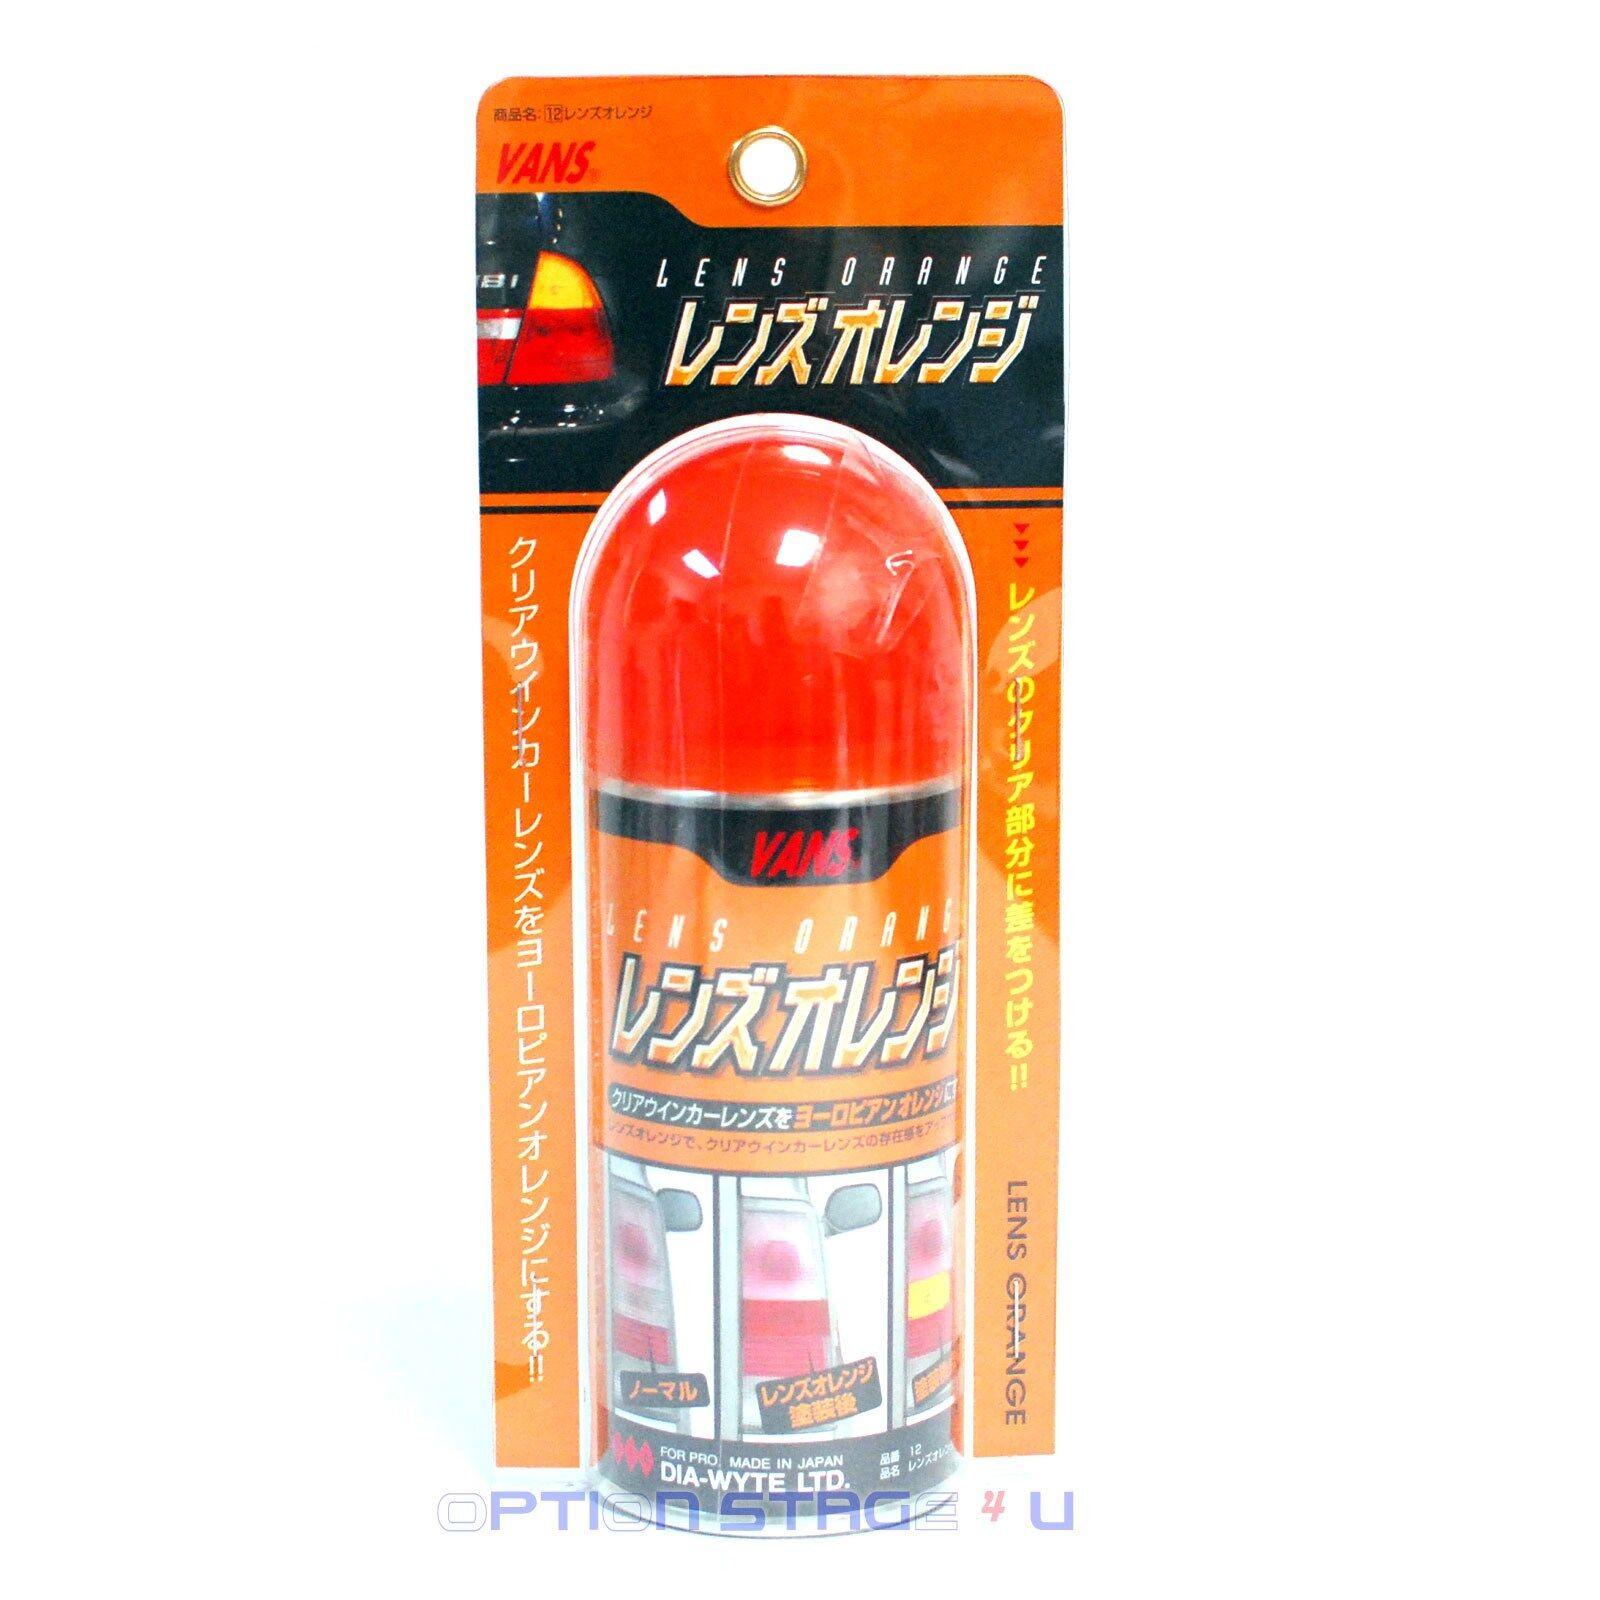 Vans Jdm Orange Lens Spray Paint Headlight Taillight Fog